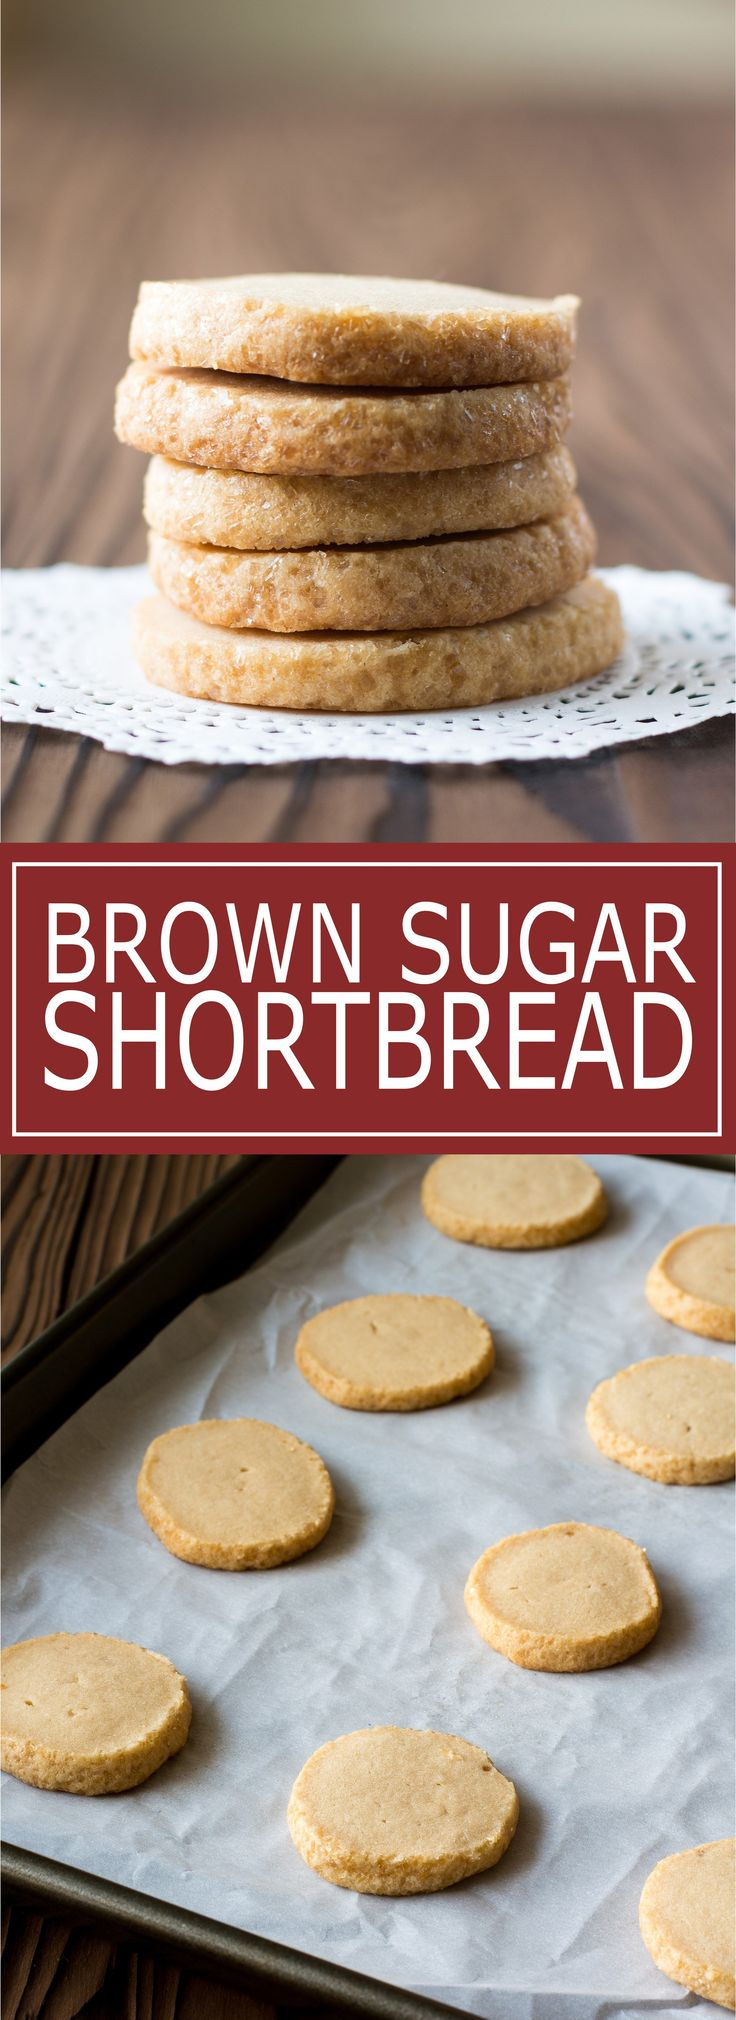 Brown Sugar Shortbread - perfectly crisp cookies with notes of caramel | Kitchen Gidget (Baking Bread Shortbread Cookies)